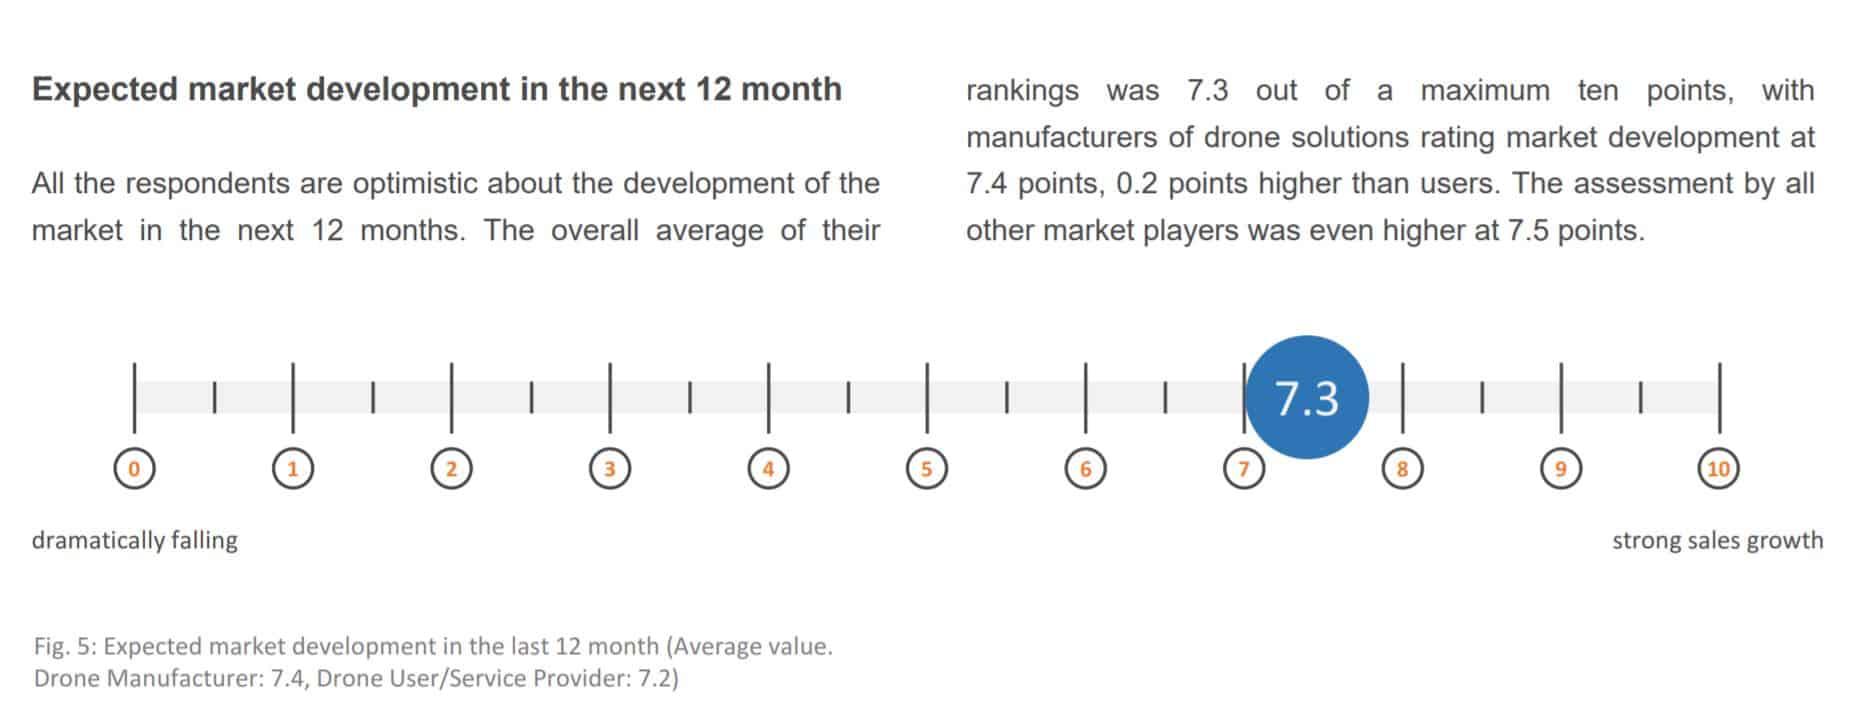 European drone market growth